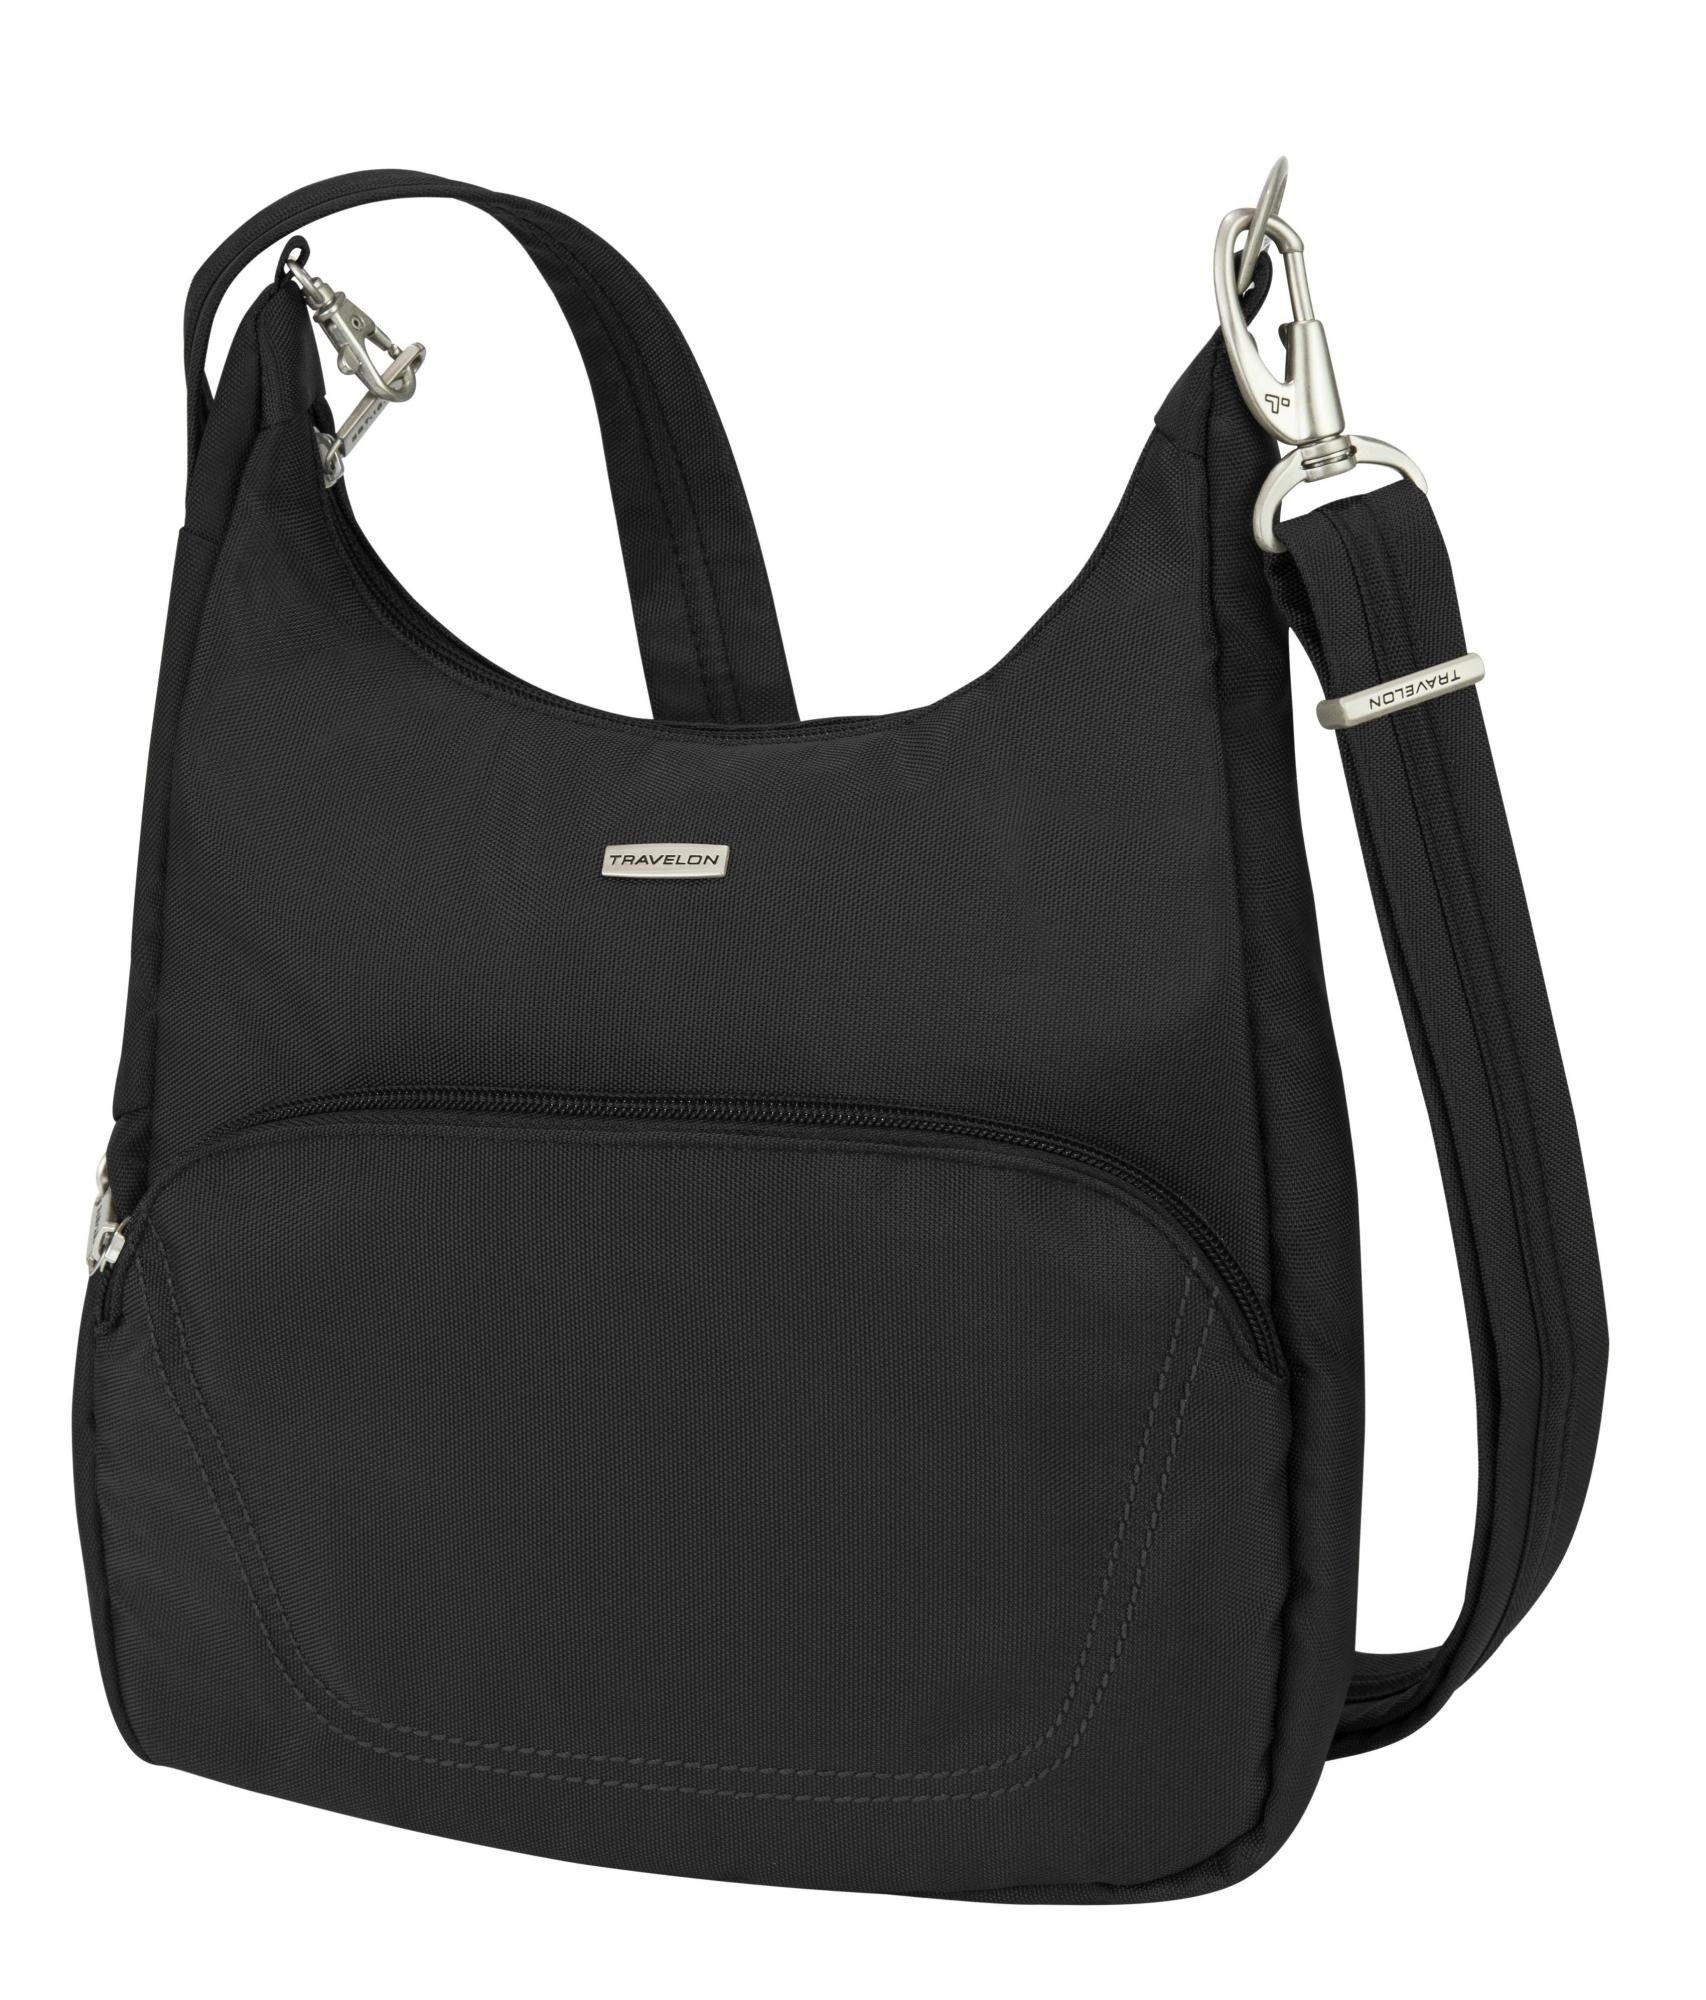 Travelon Anti-Theft Classic Essential Messenger Bag, Black